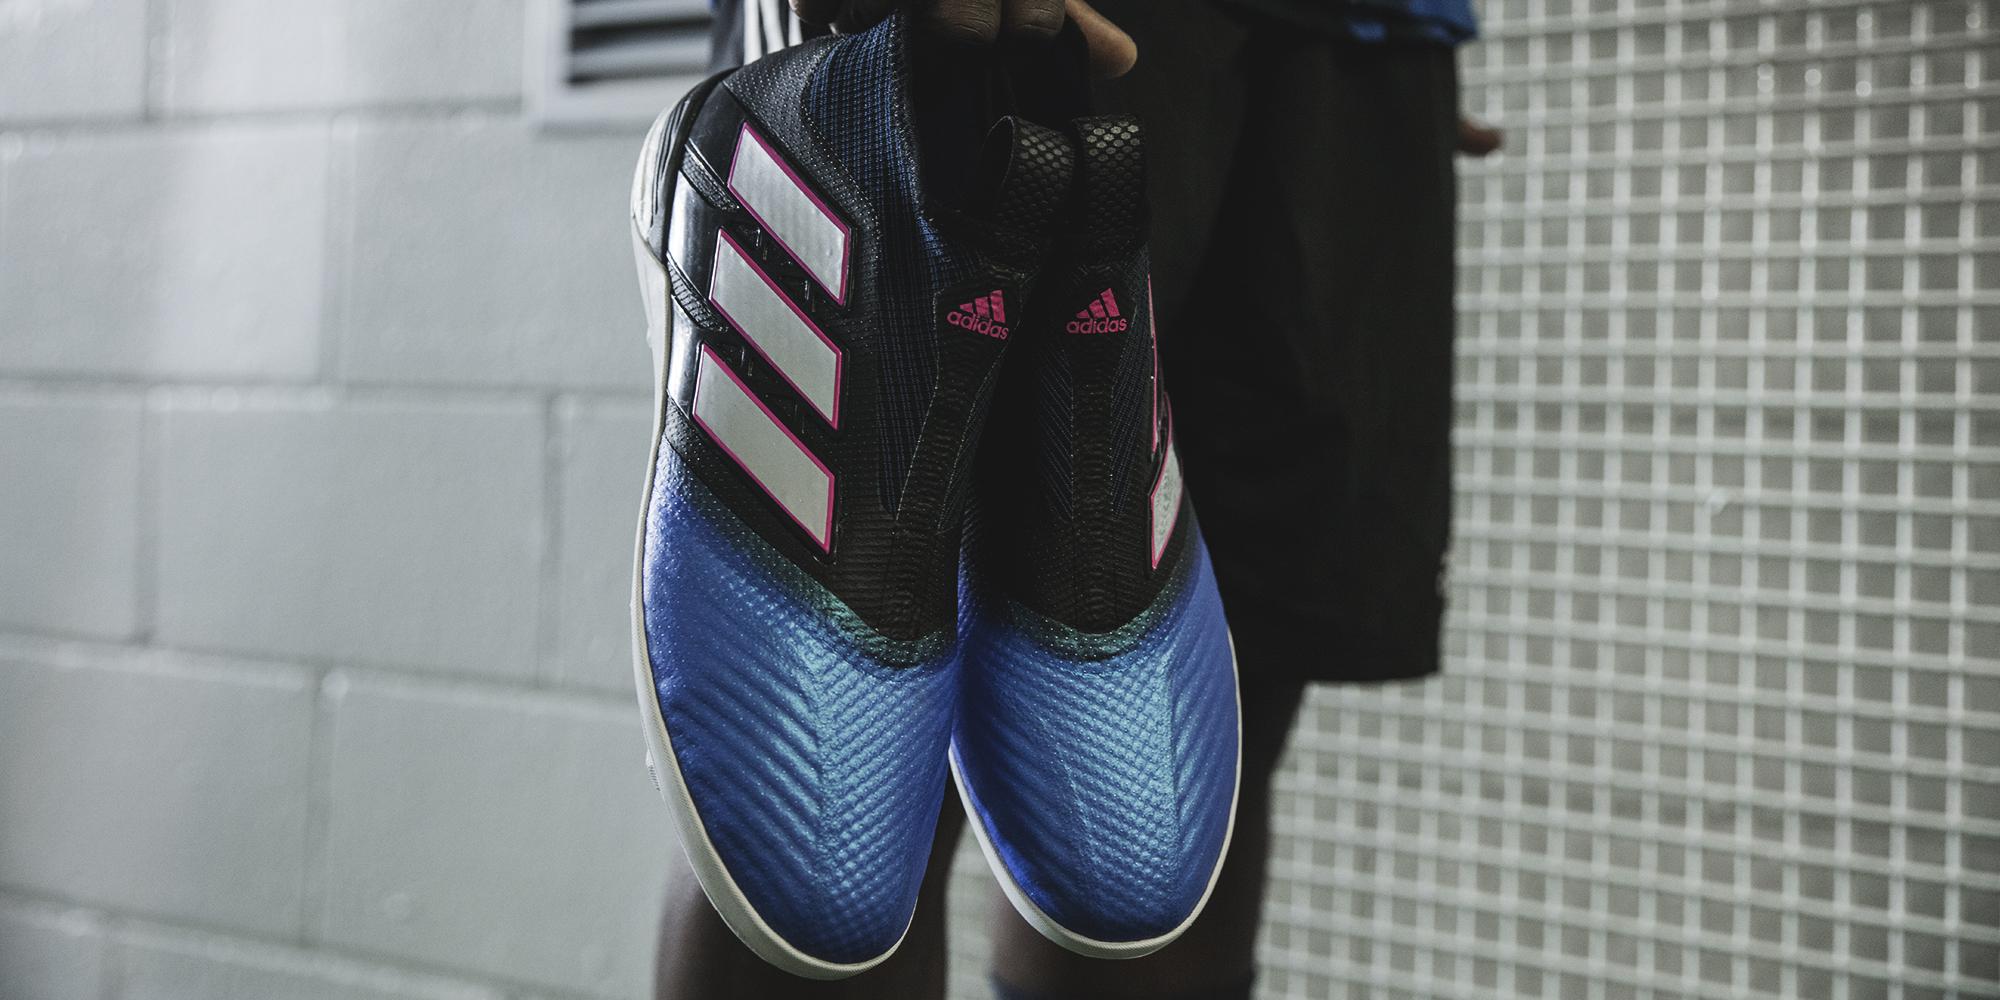 adidas-ace-17-purecontrol-blue-bast-02